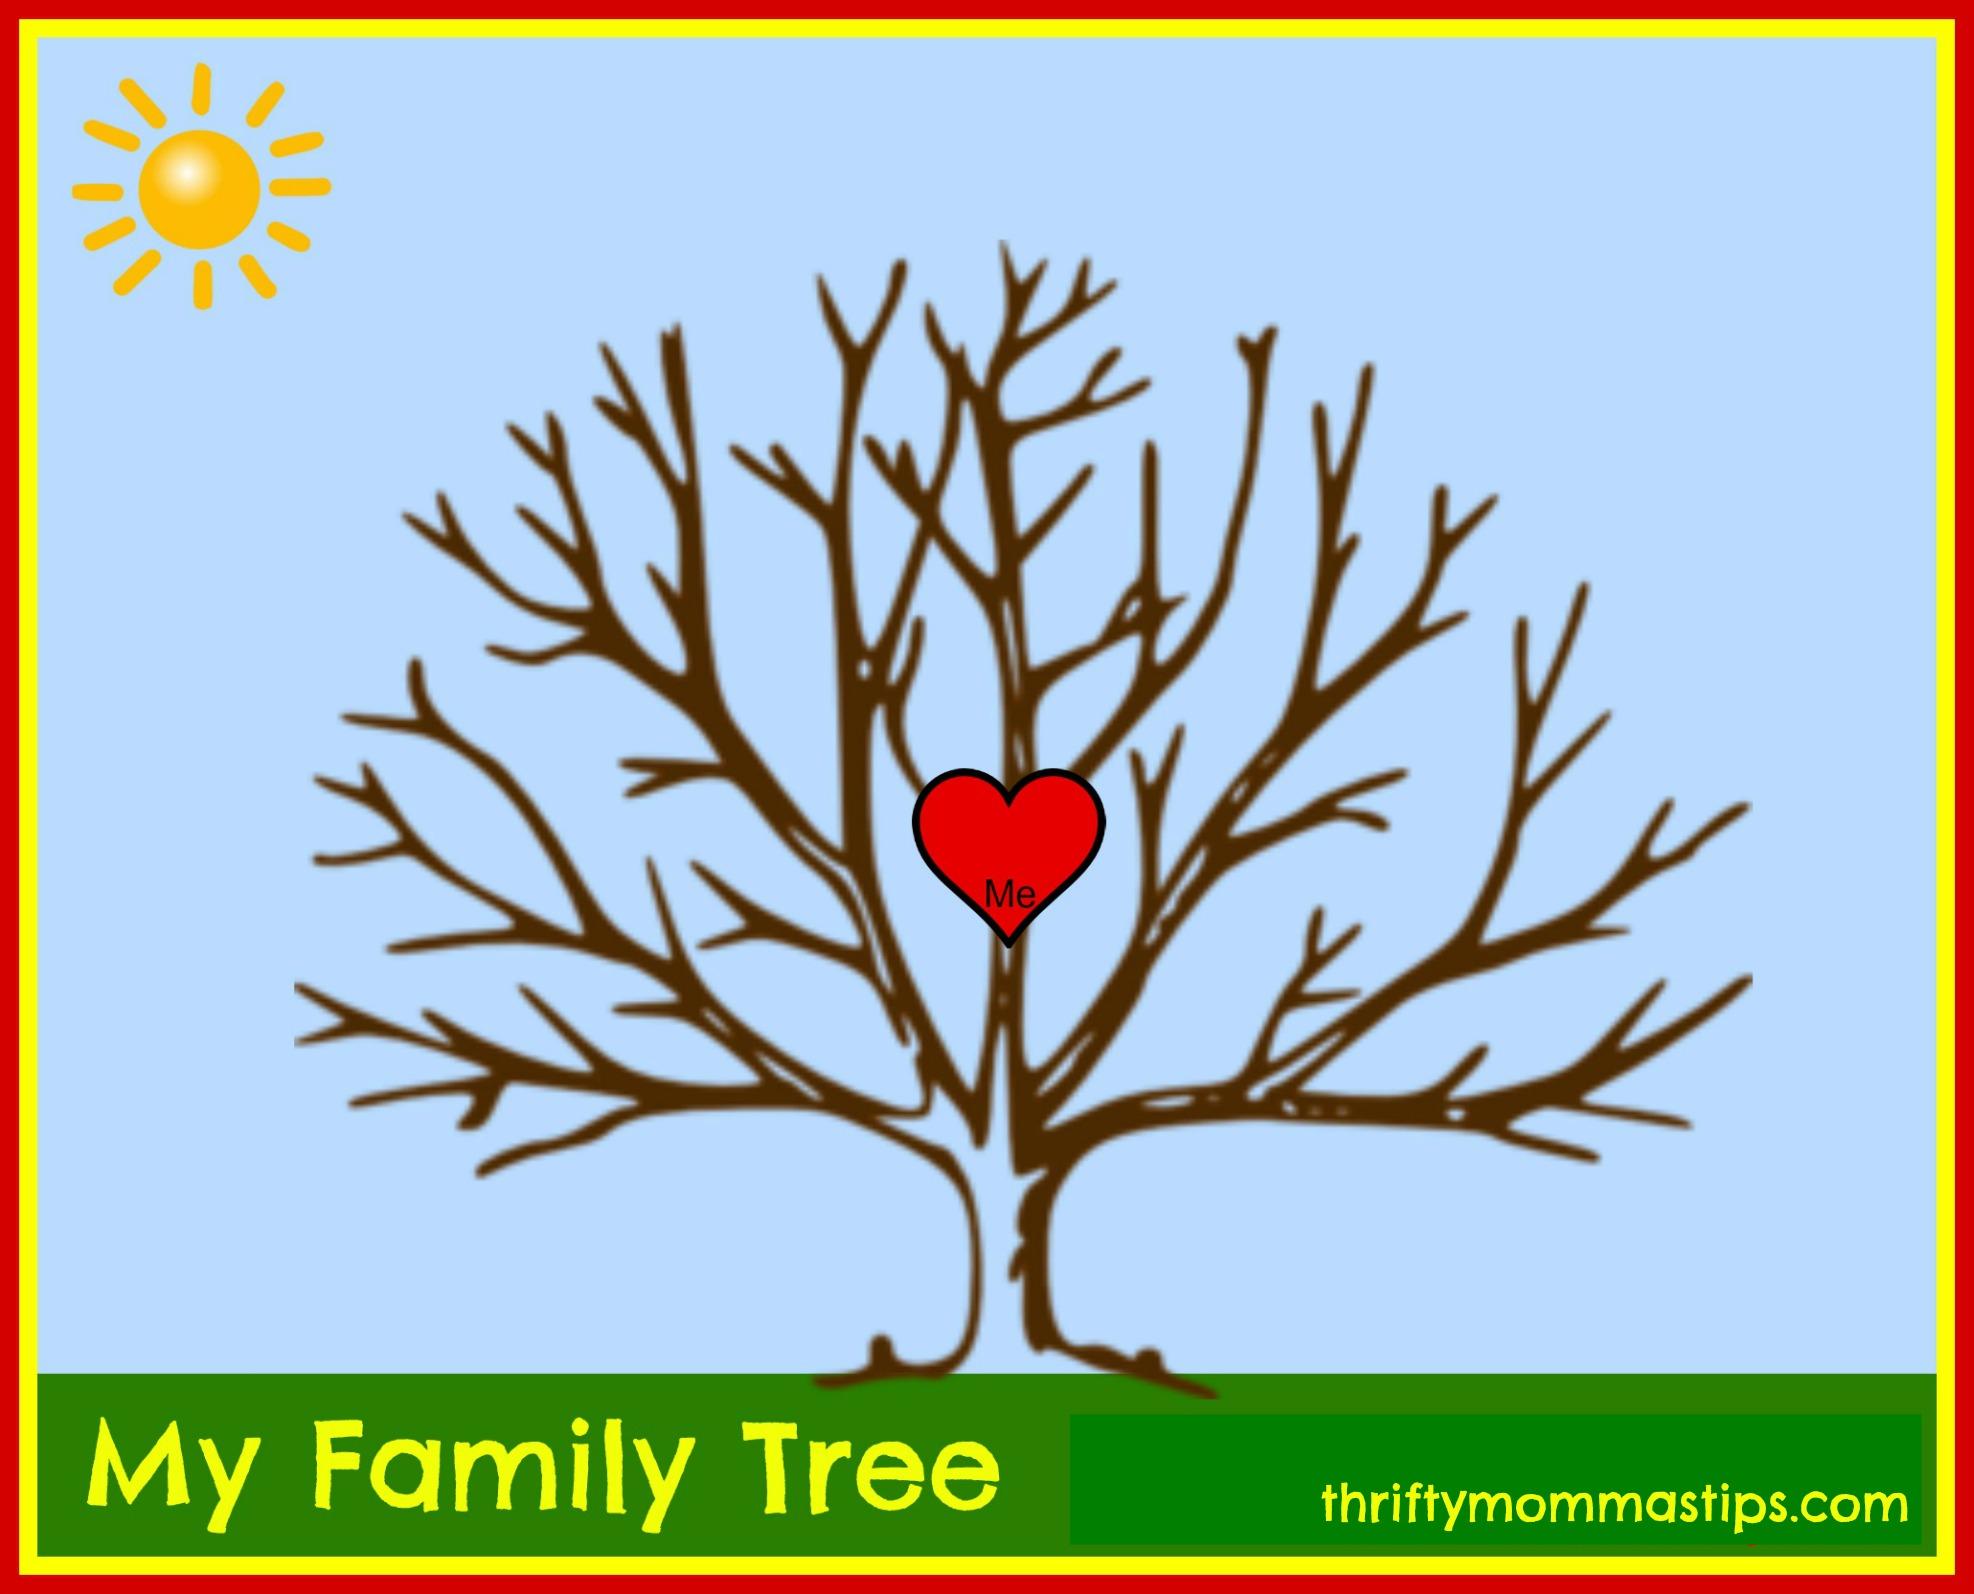 Alternative family tree for adoptive families